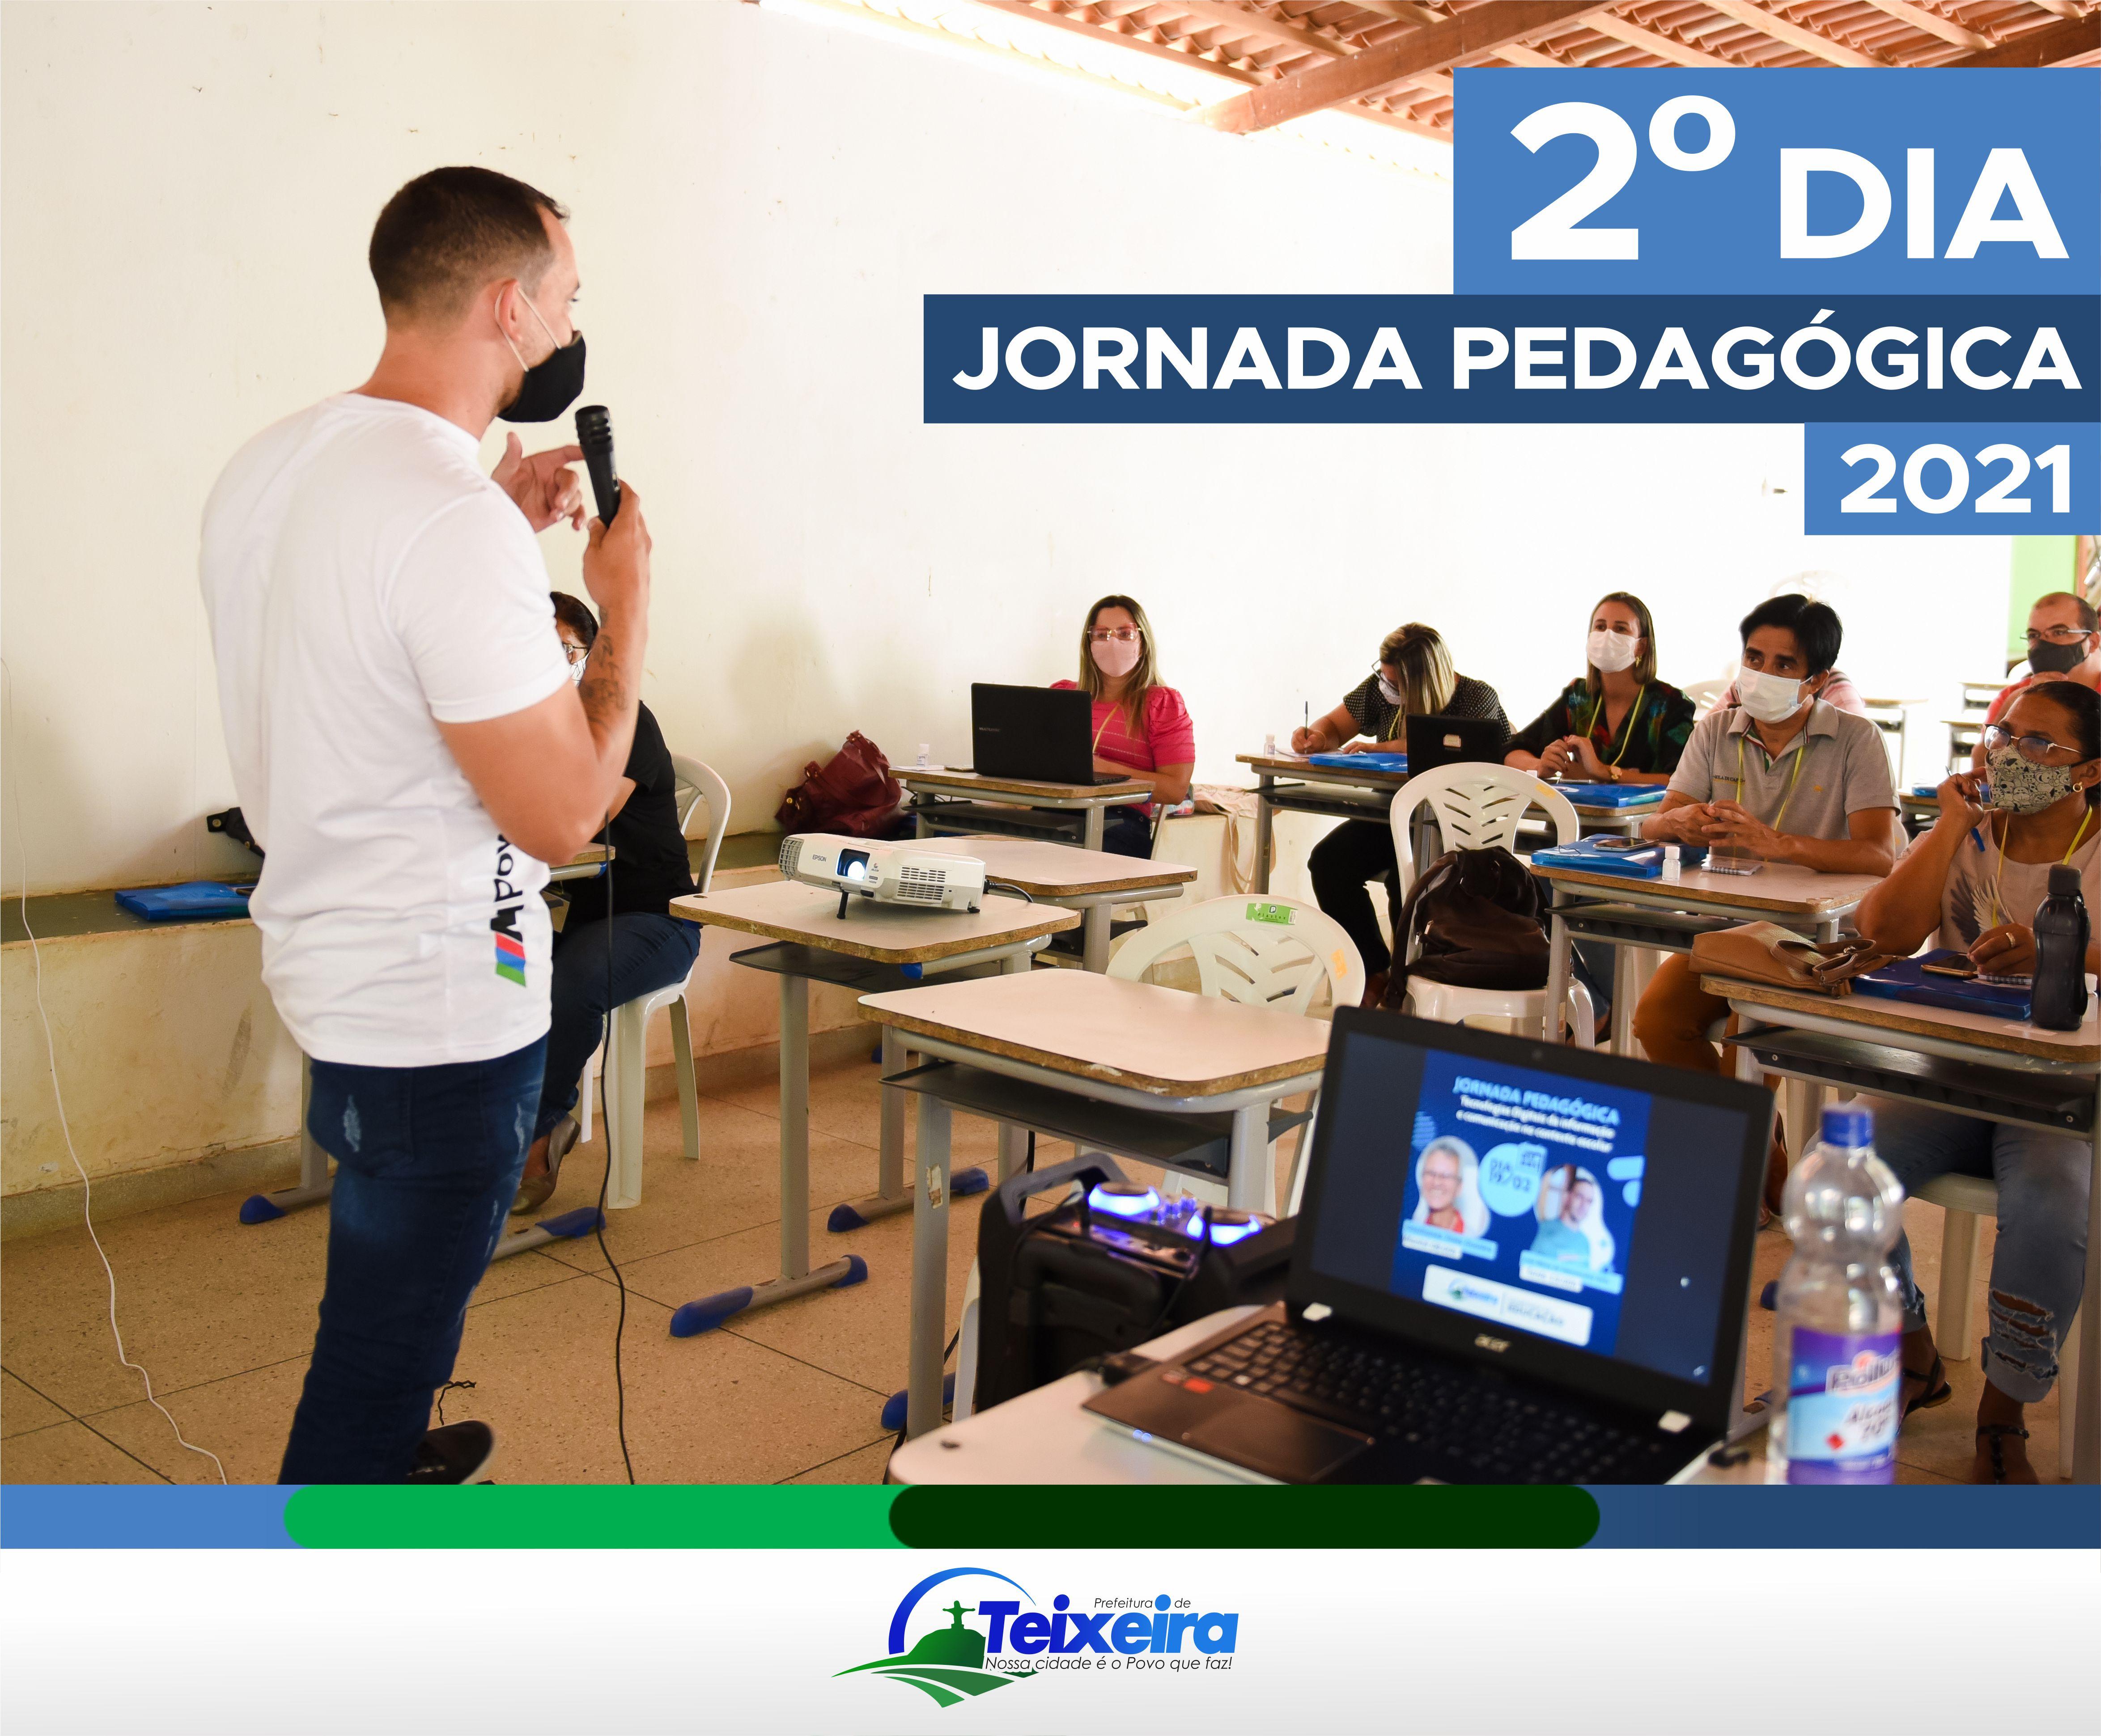 jornada-pedagogica.jpg